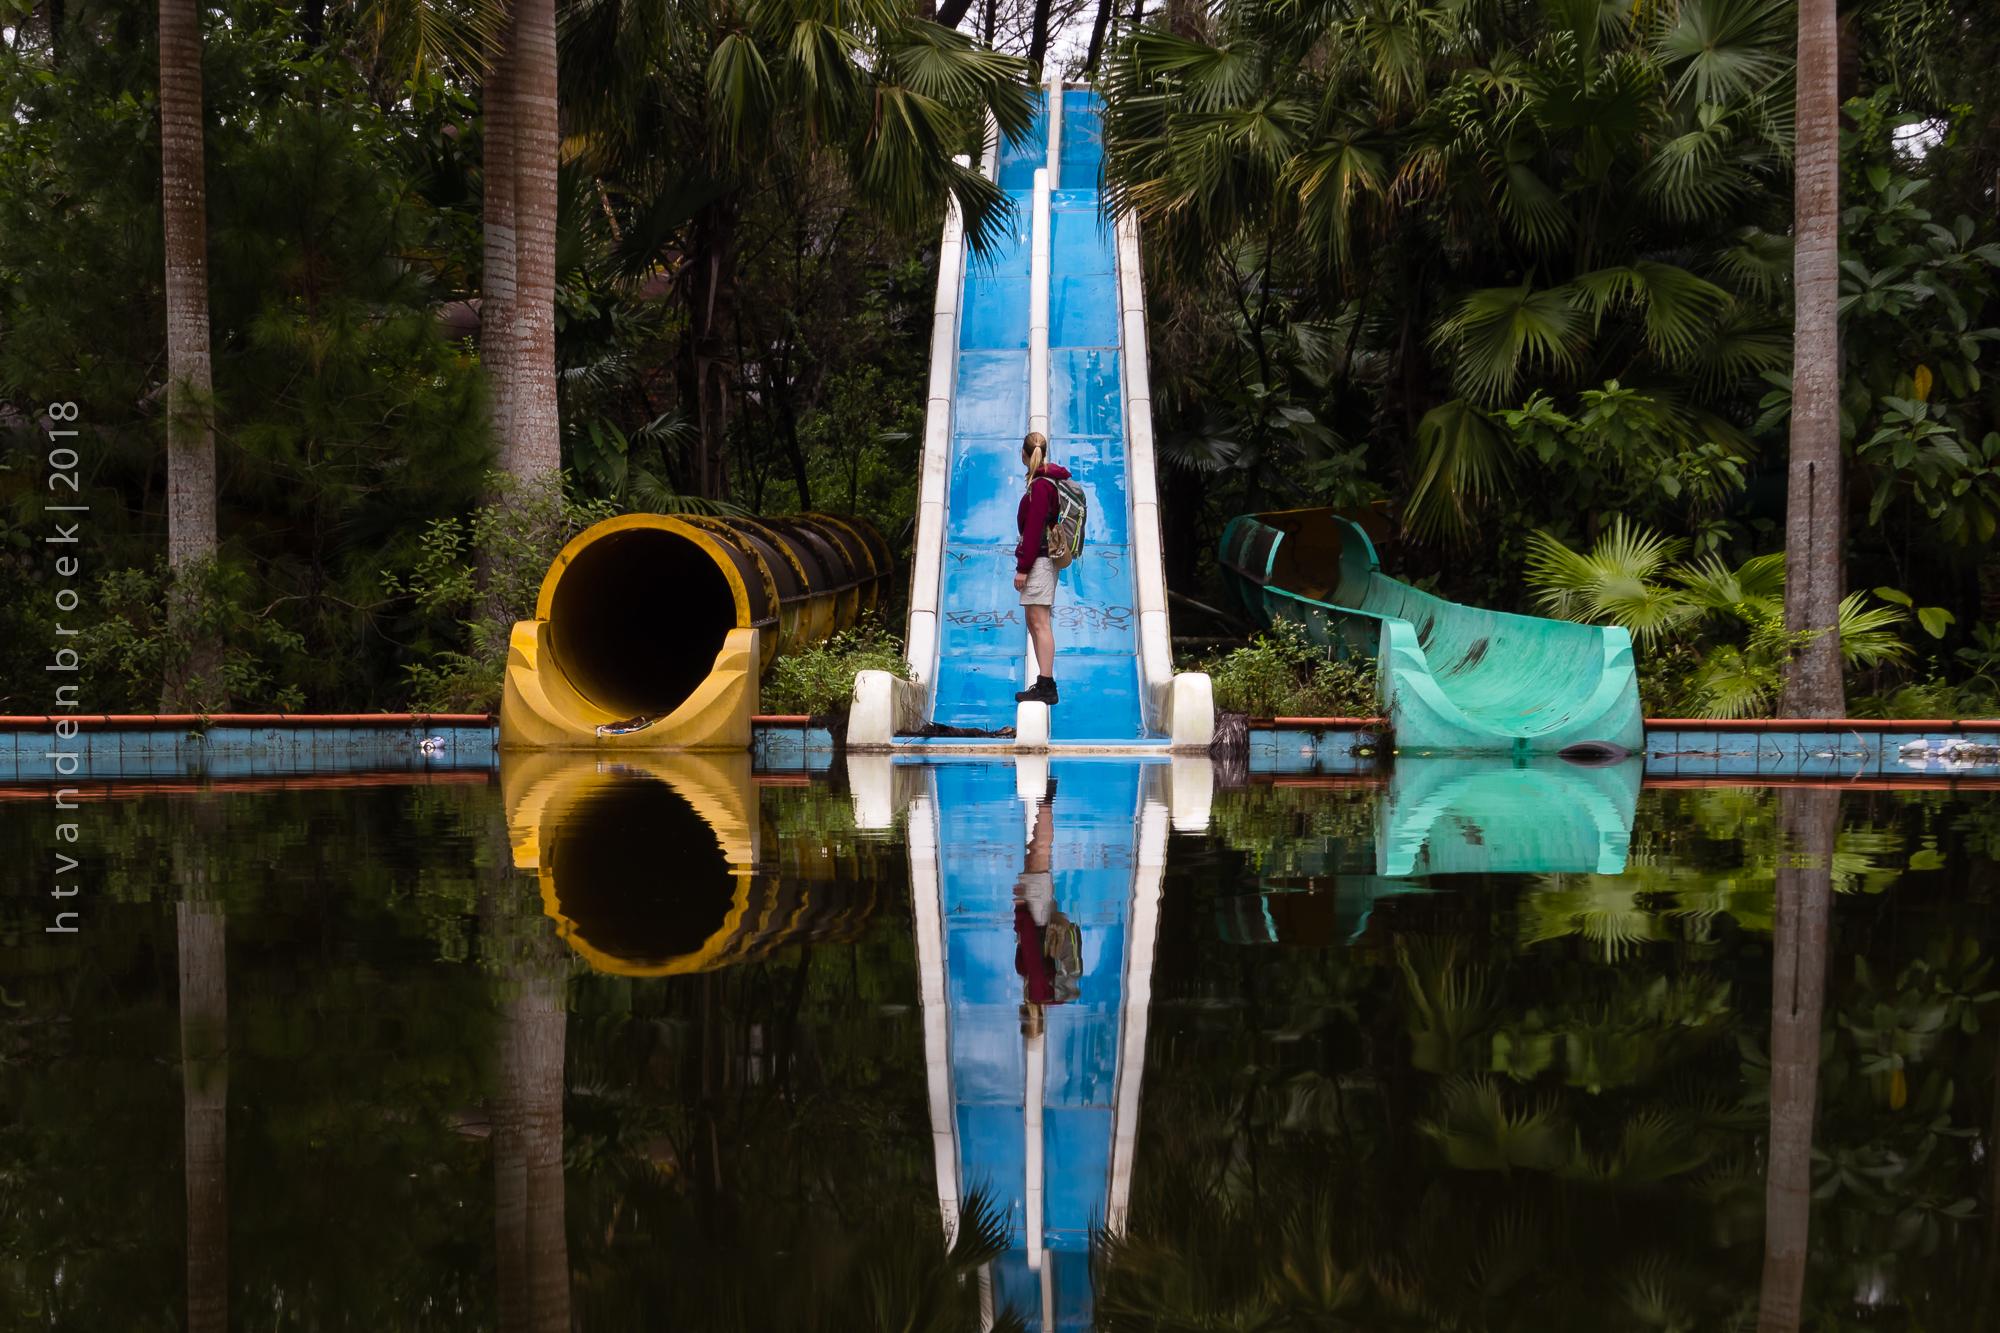 Abandoned Waterpark Hue, Vietnam